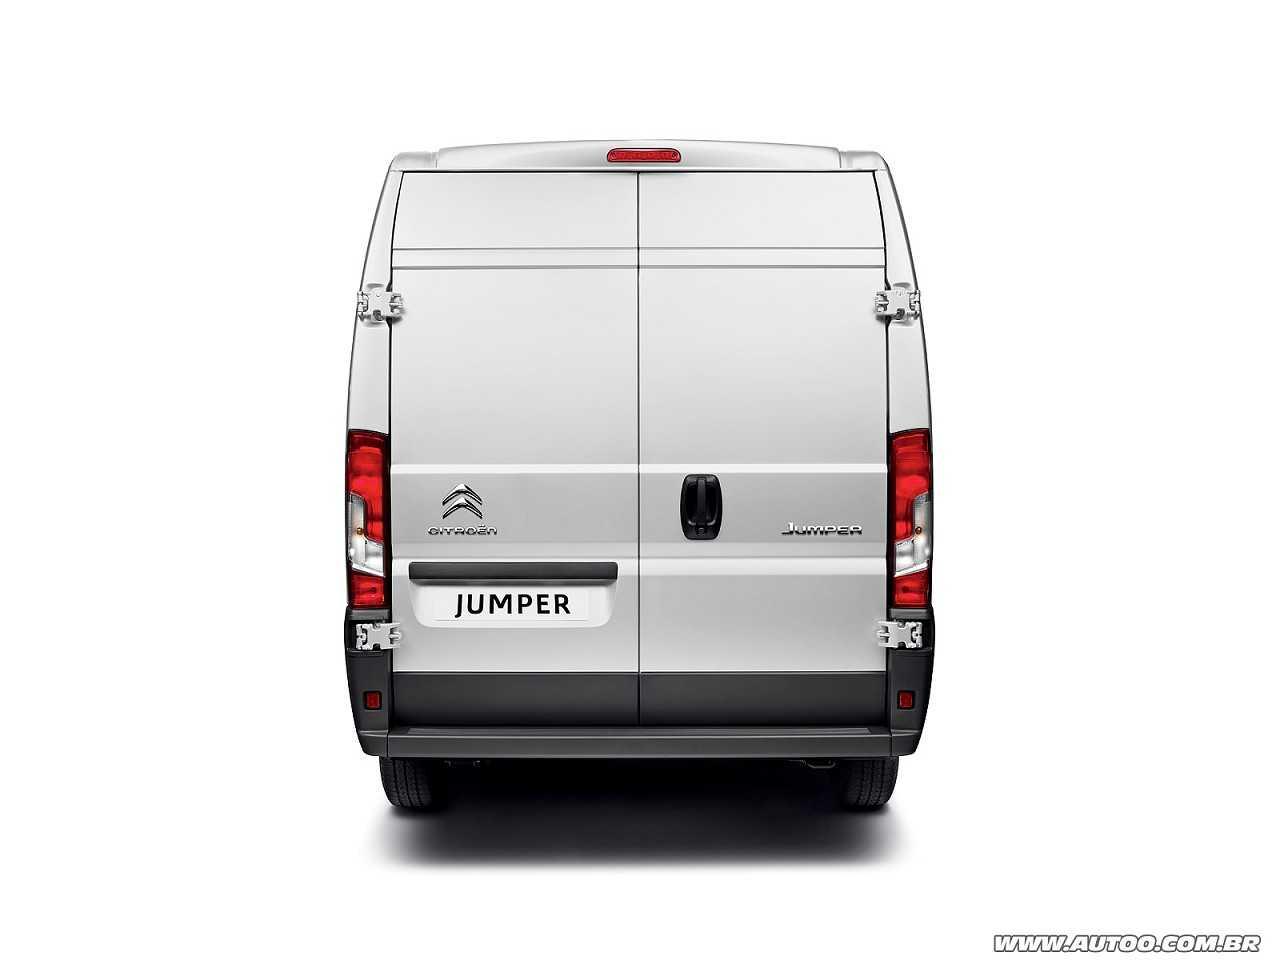 CitroënJumper 2019 - traseira